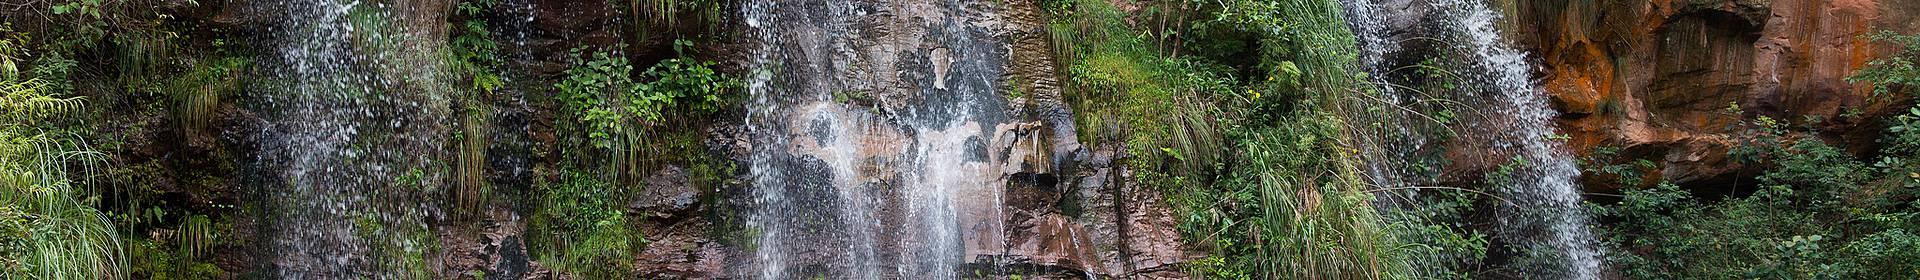 Cascada de Cuevas